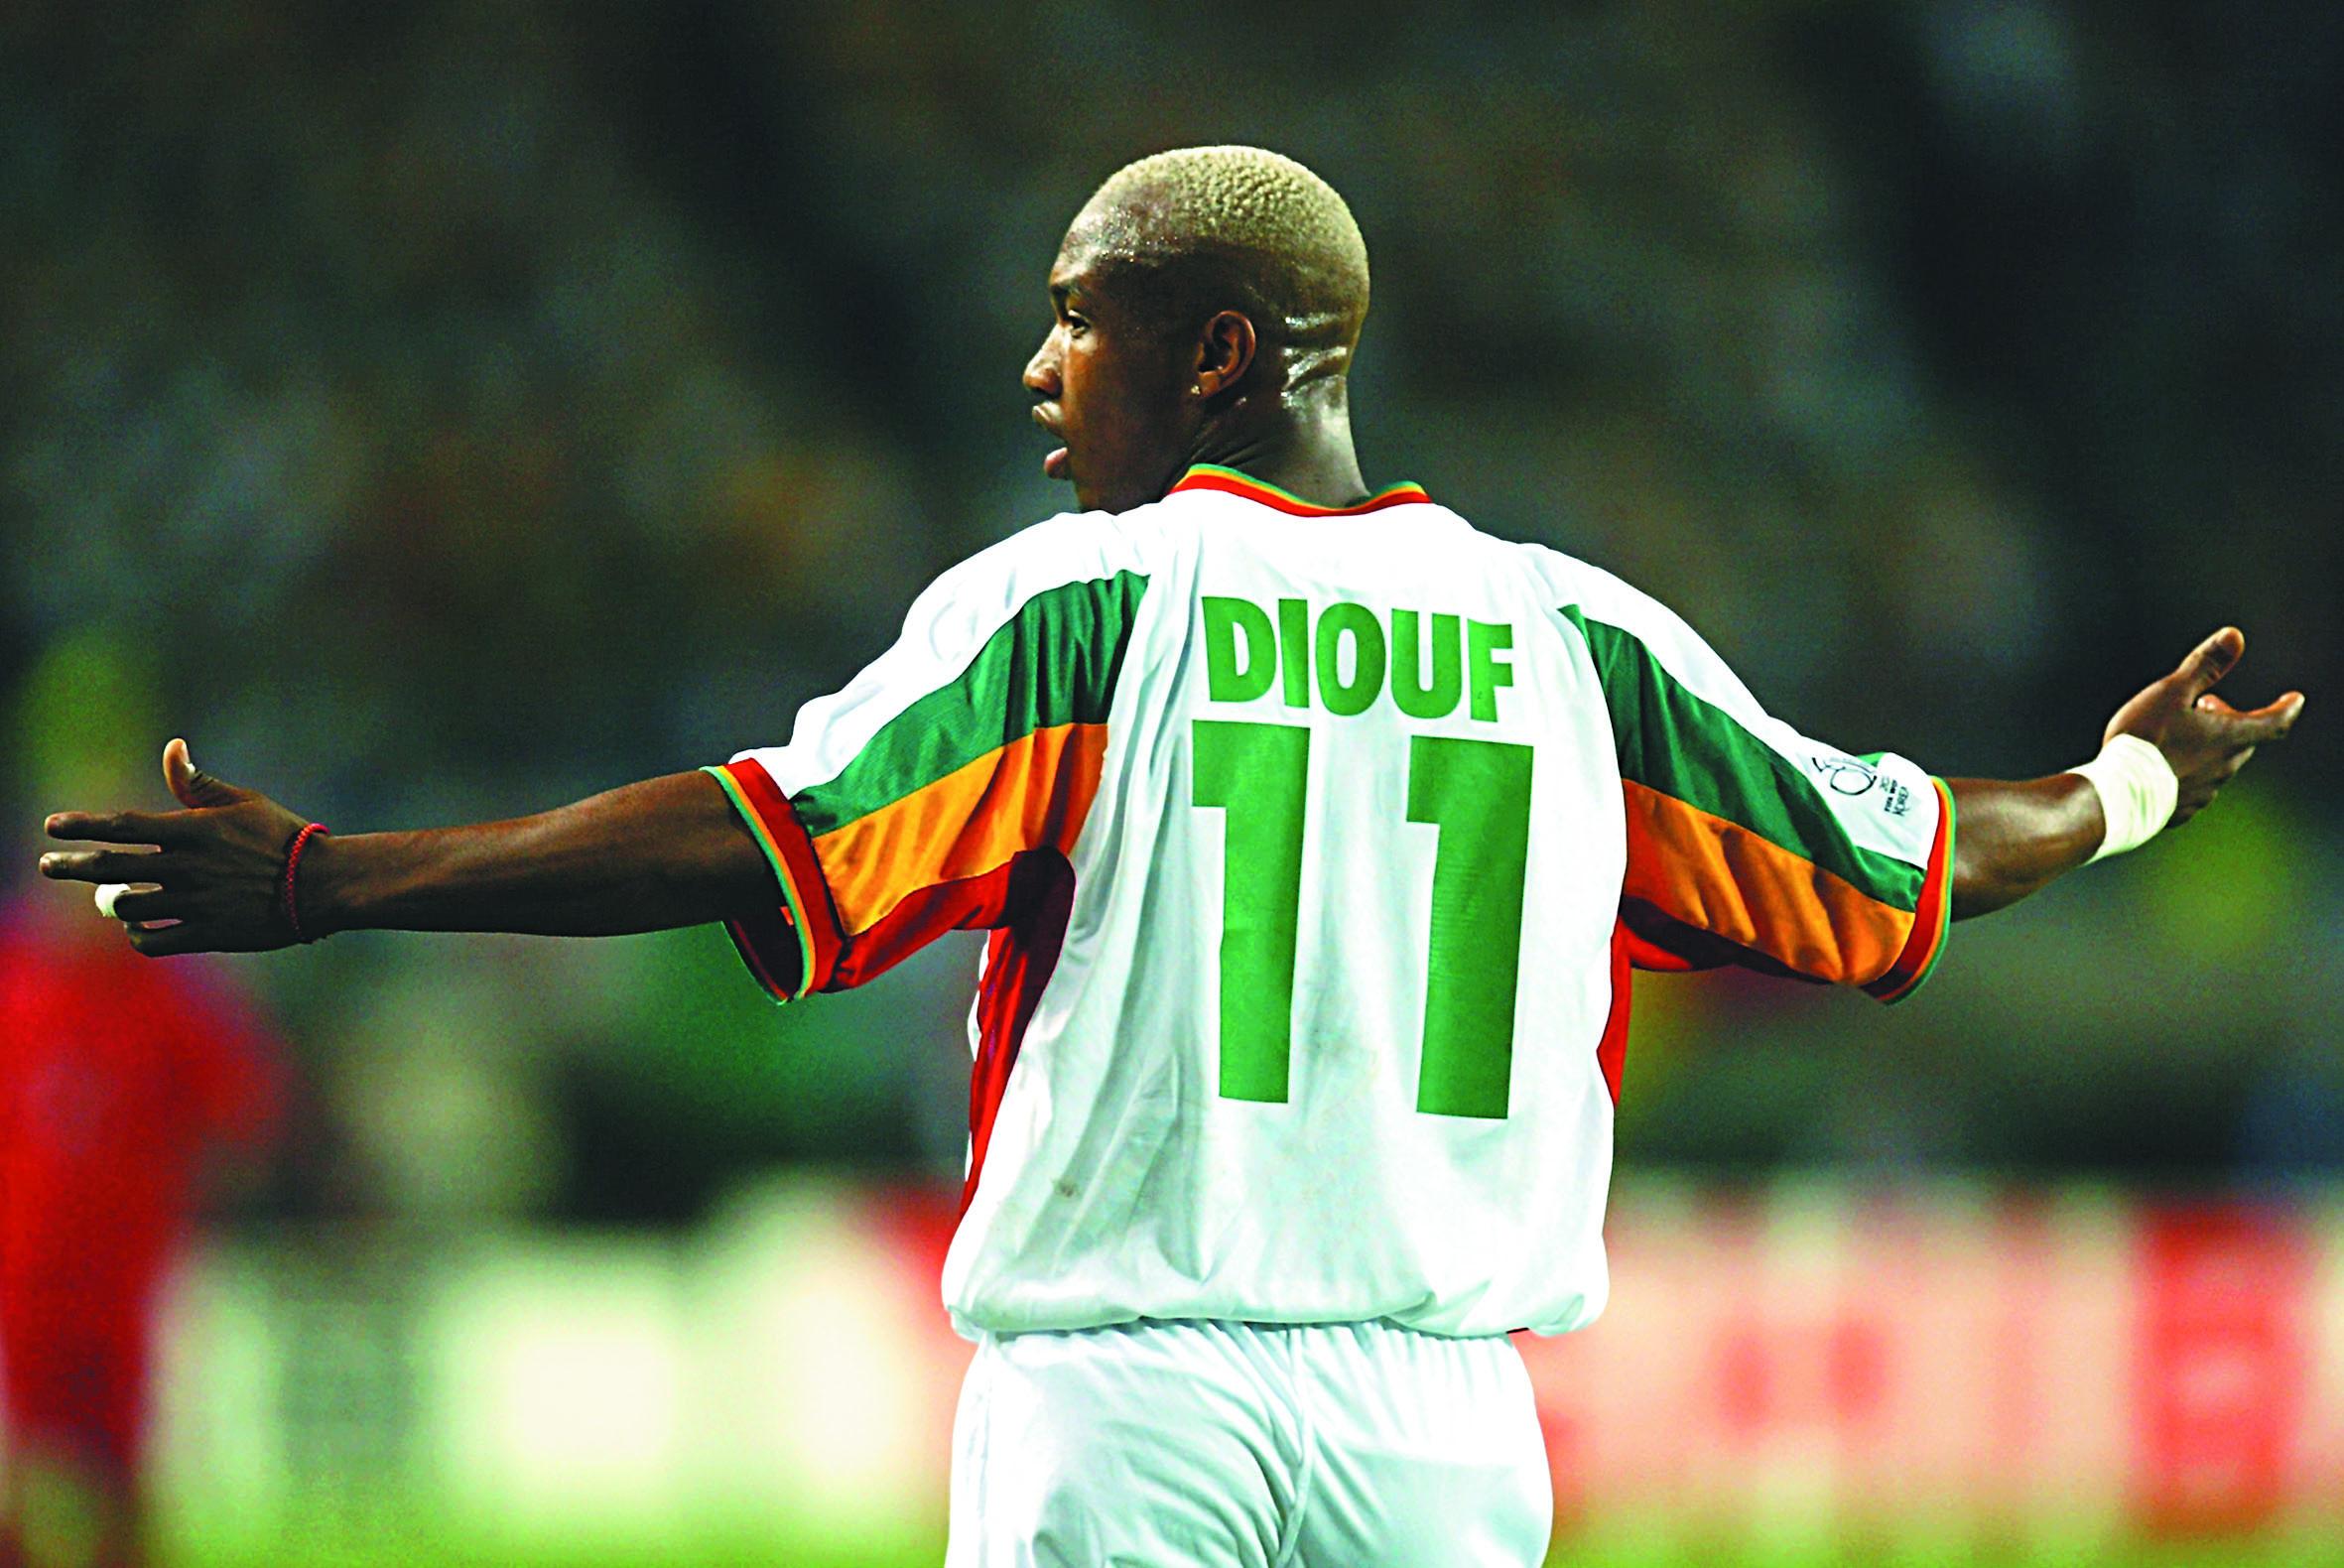 El Hadji Diouf, de Liverpool à la Malaisie, en rêvant du Sénégal